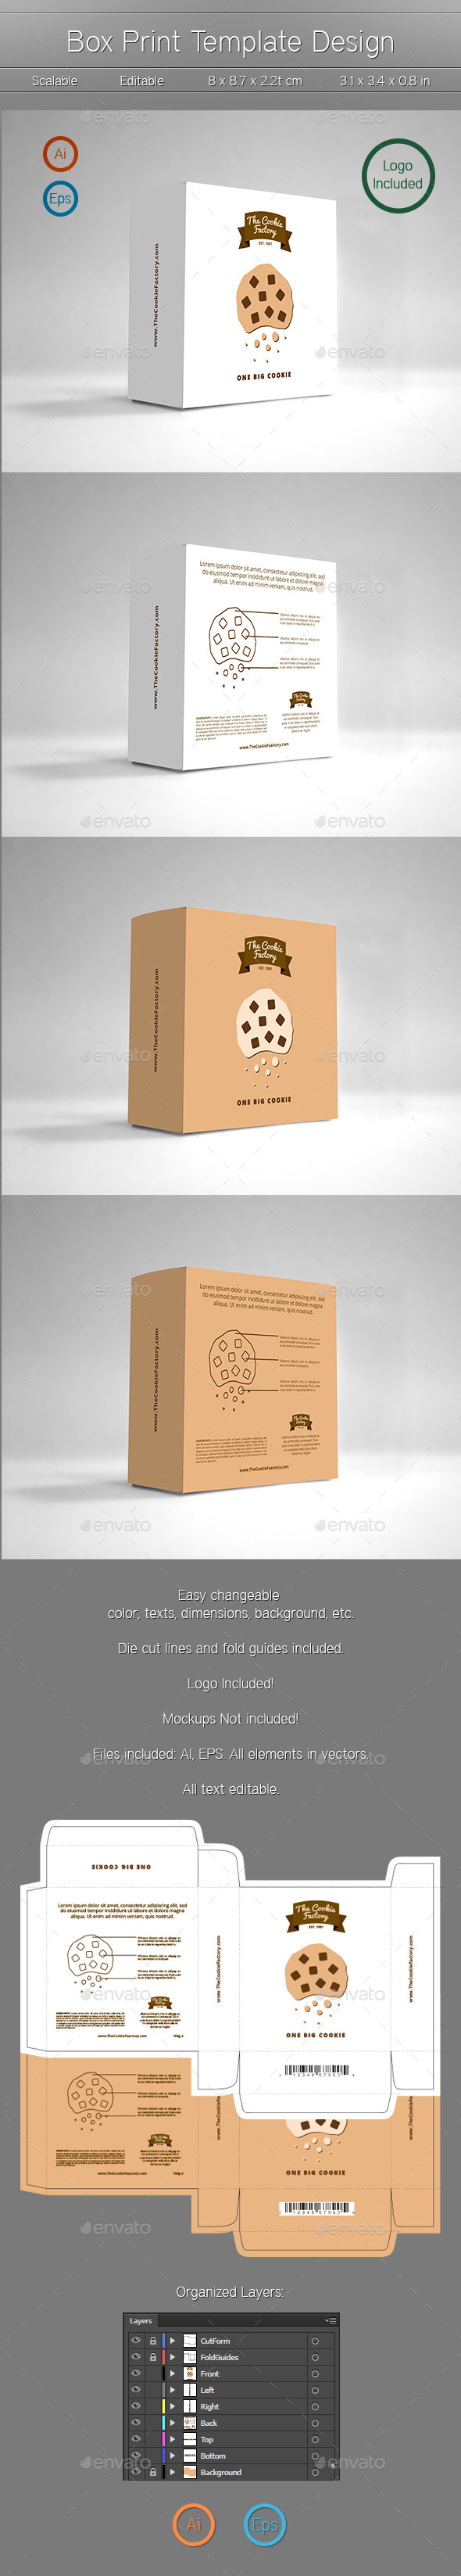 Box Design - Packaging Print Templates